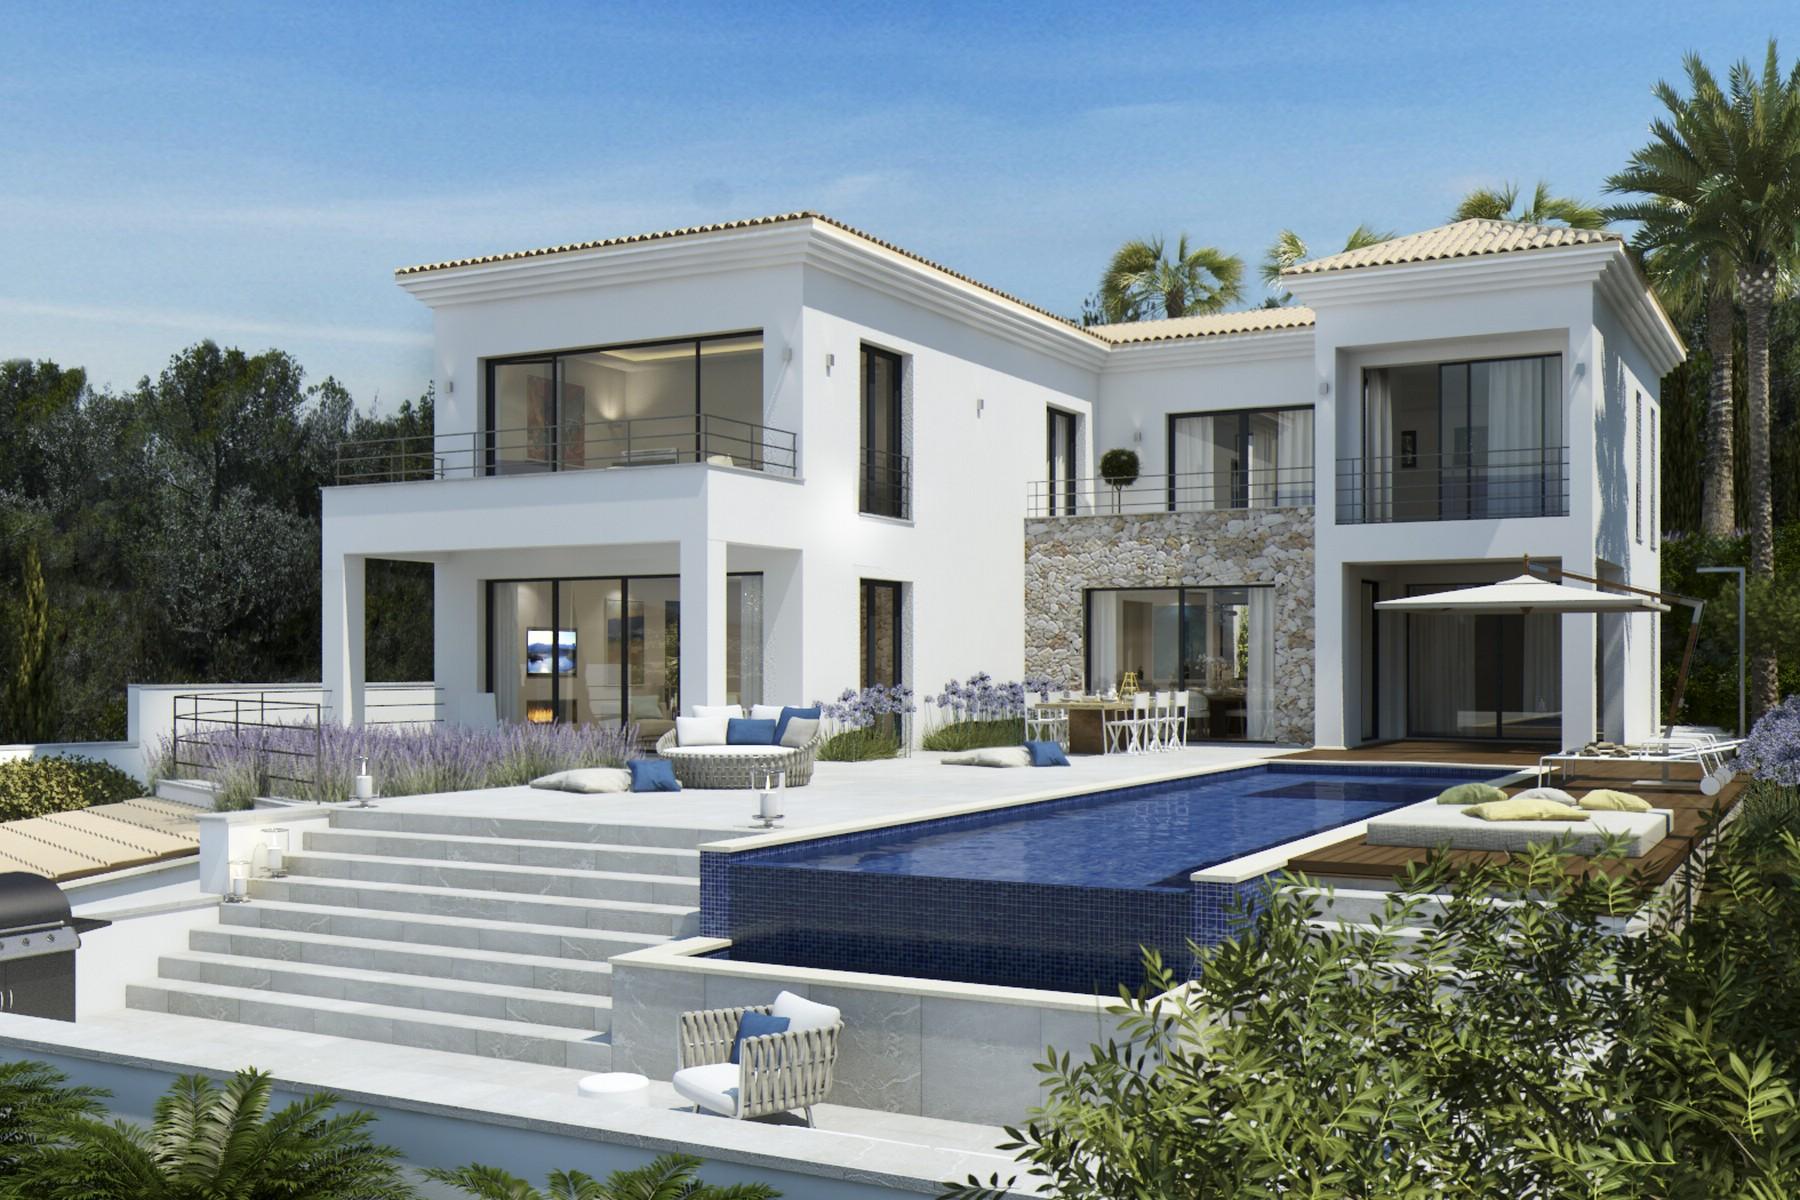 Single Family Home for Sale at Renewed Villa with seaview in Santa Ponsa Nova Santa Ponsa, Mallorca, 07180 Spain